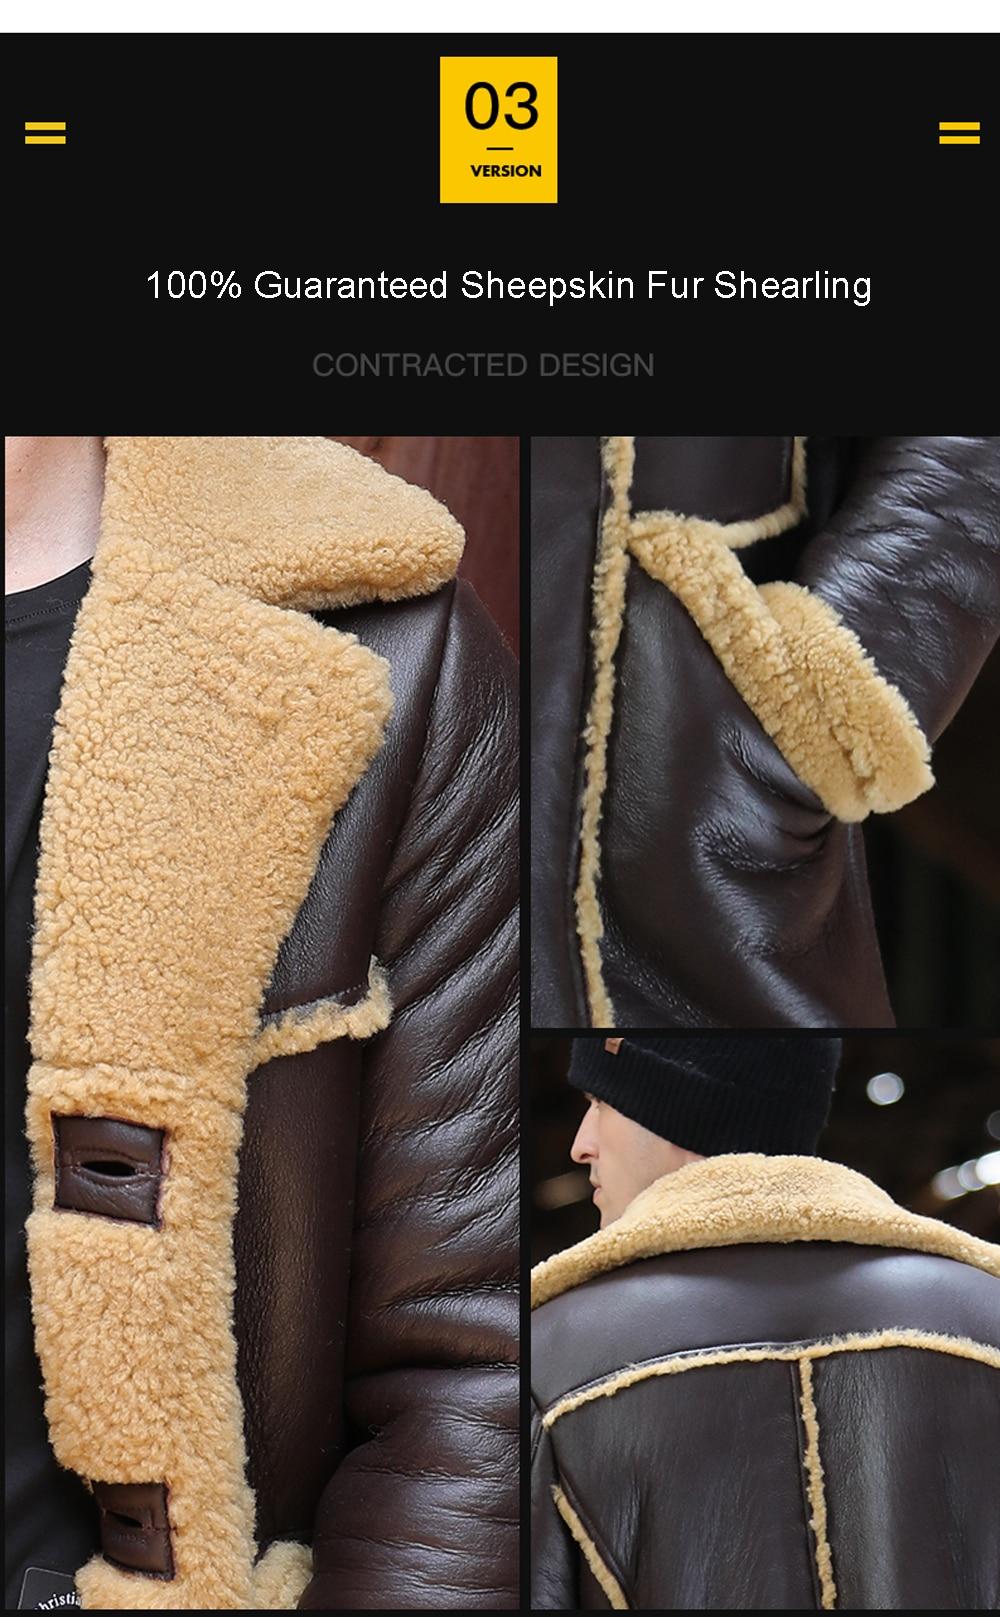 He0d32f62f8f440969a8063f3c183768ef Men Luxury Fur Shearling Coat Yellow Soft Thicken Fur Coat Winter Male Formal Business Fur Sheepskin Jackets